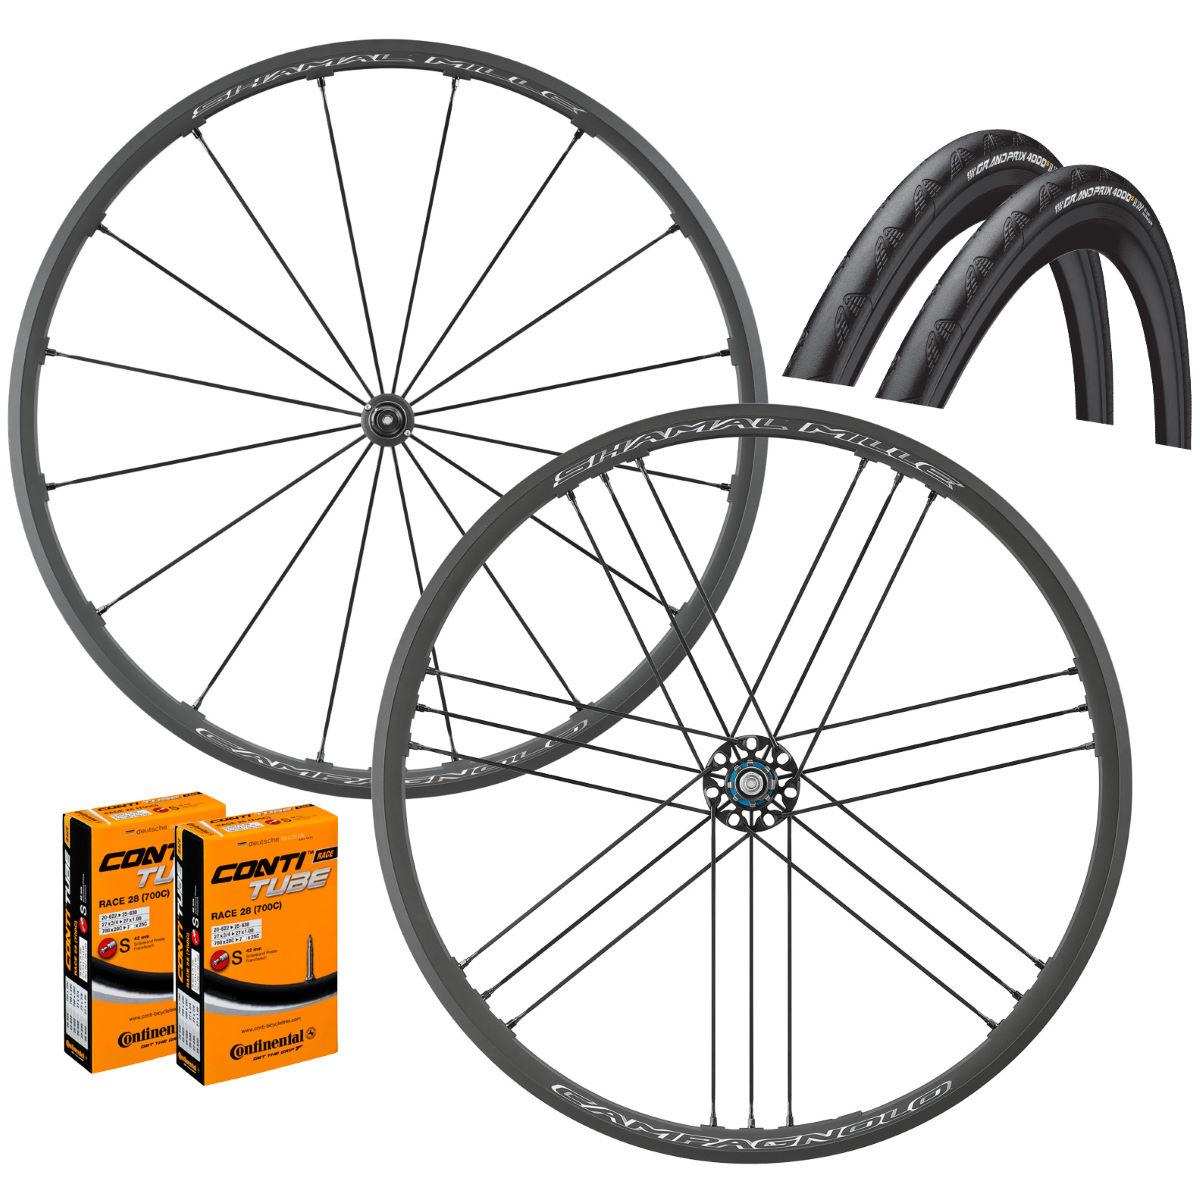 Campagnolo Shamal Mille C17 Clincher Wheels GP4000s II Bundle Wheel Sets